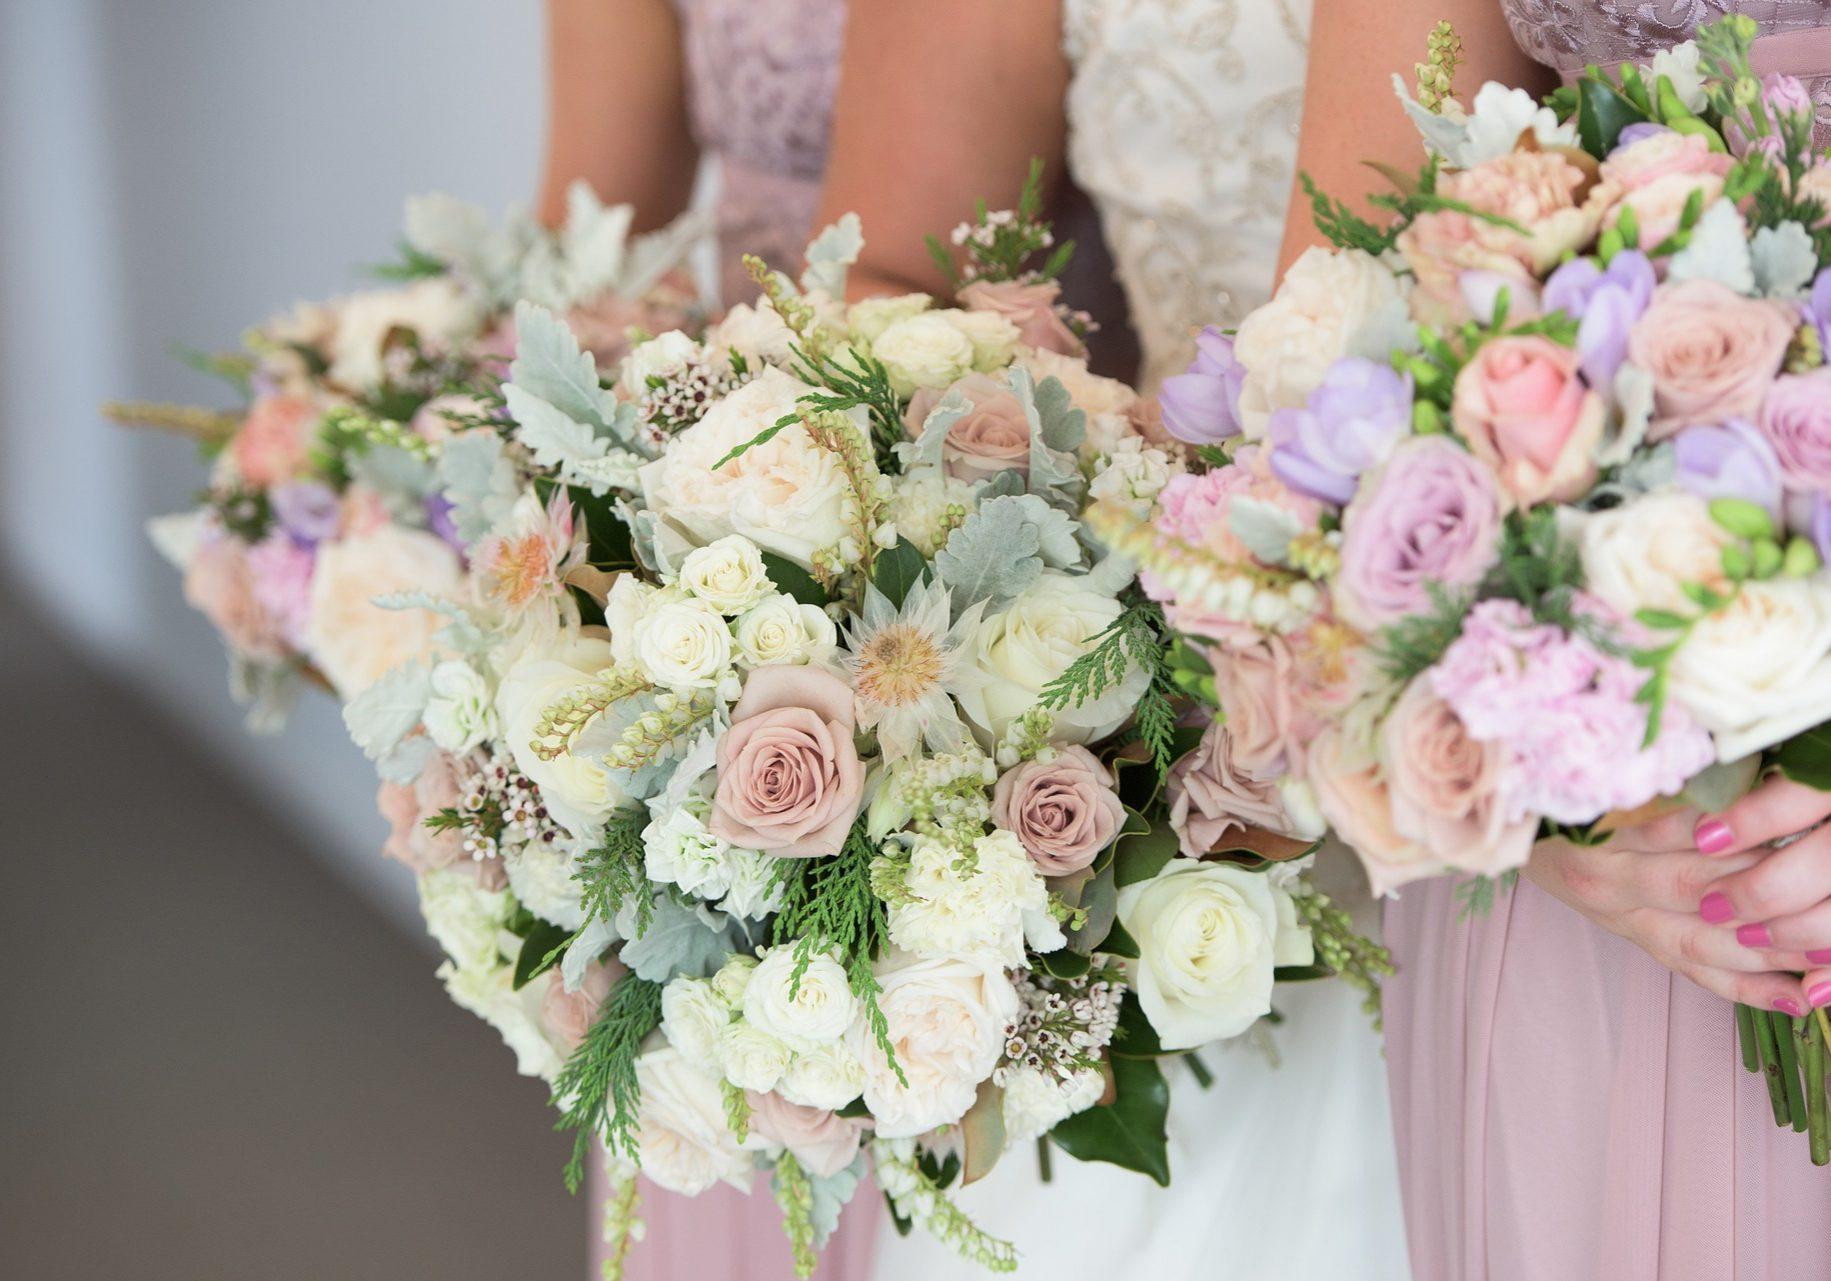 wedding-flowers-2051724_1920